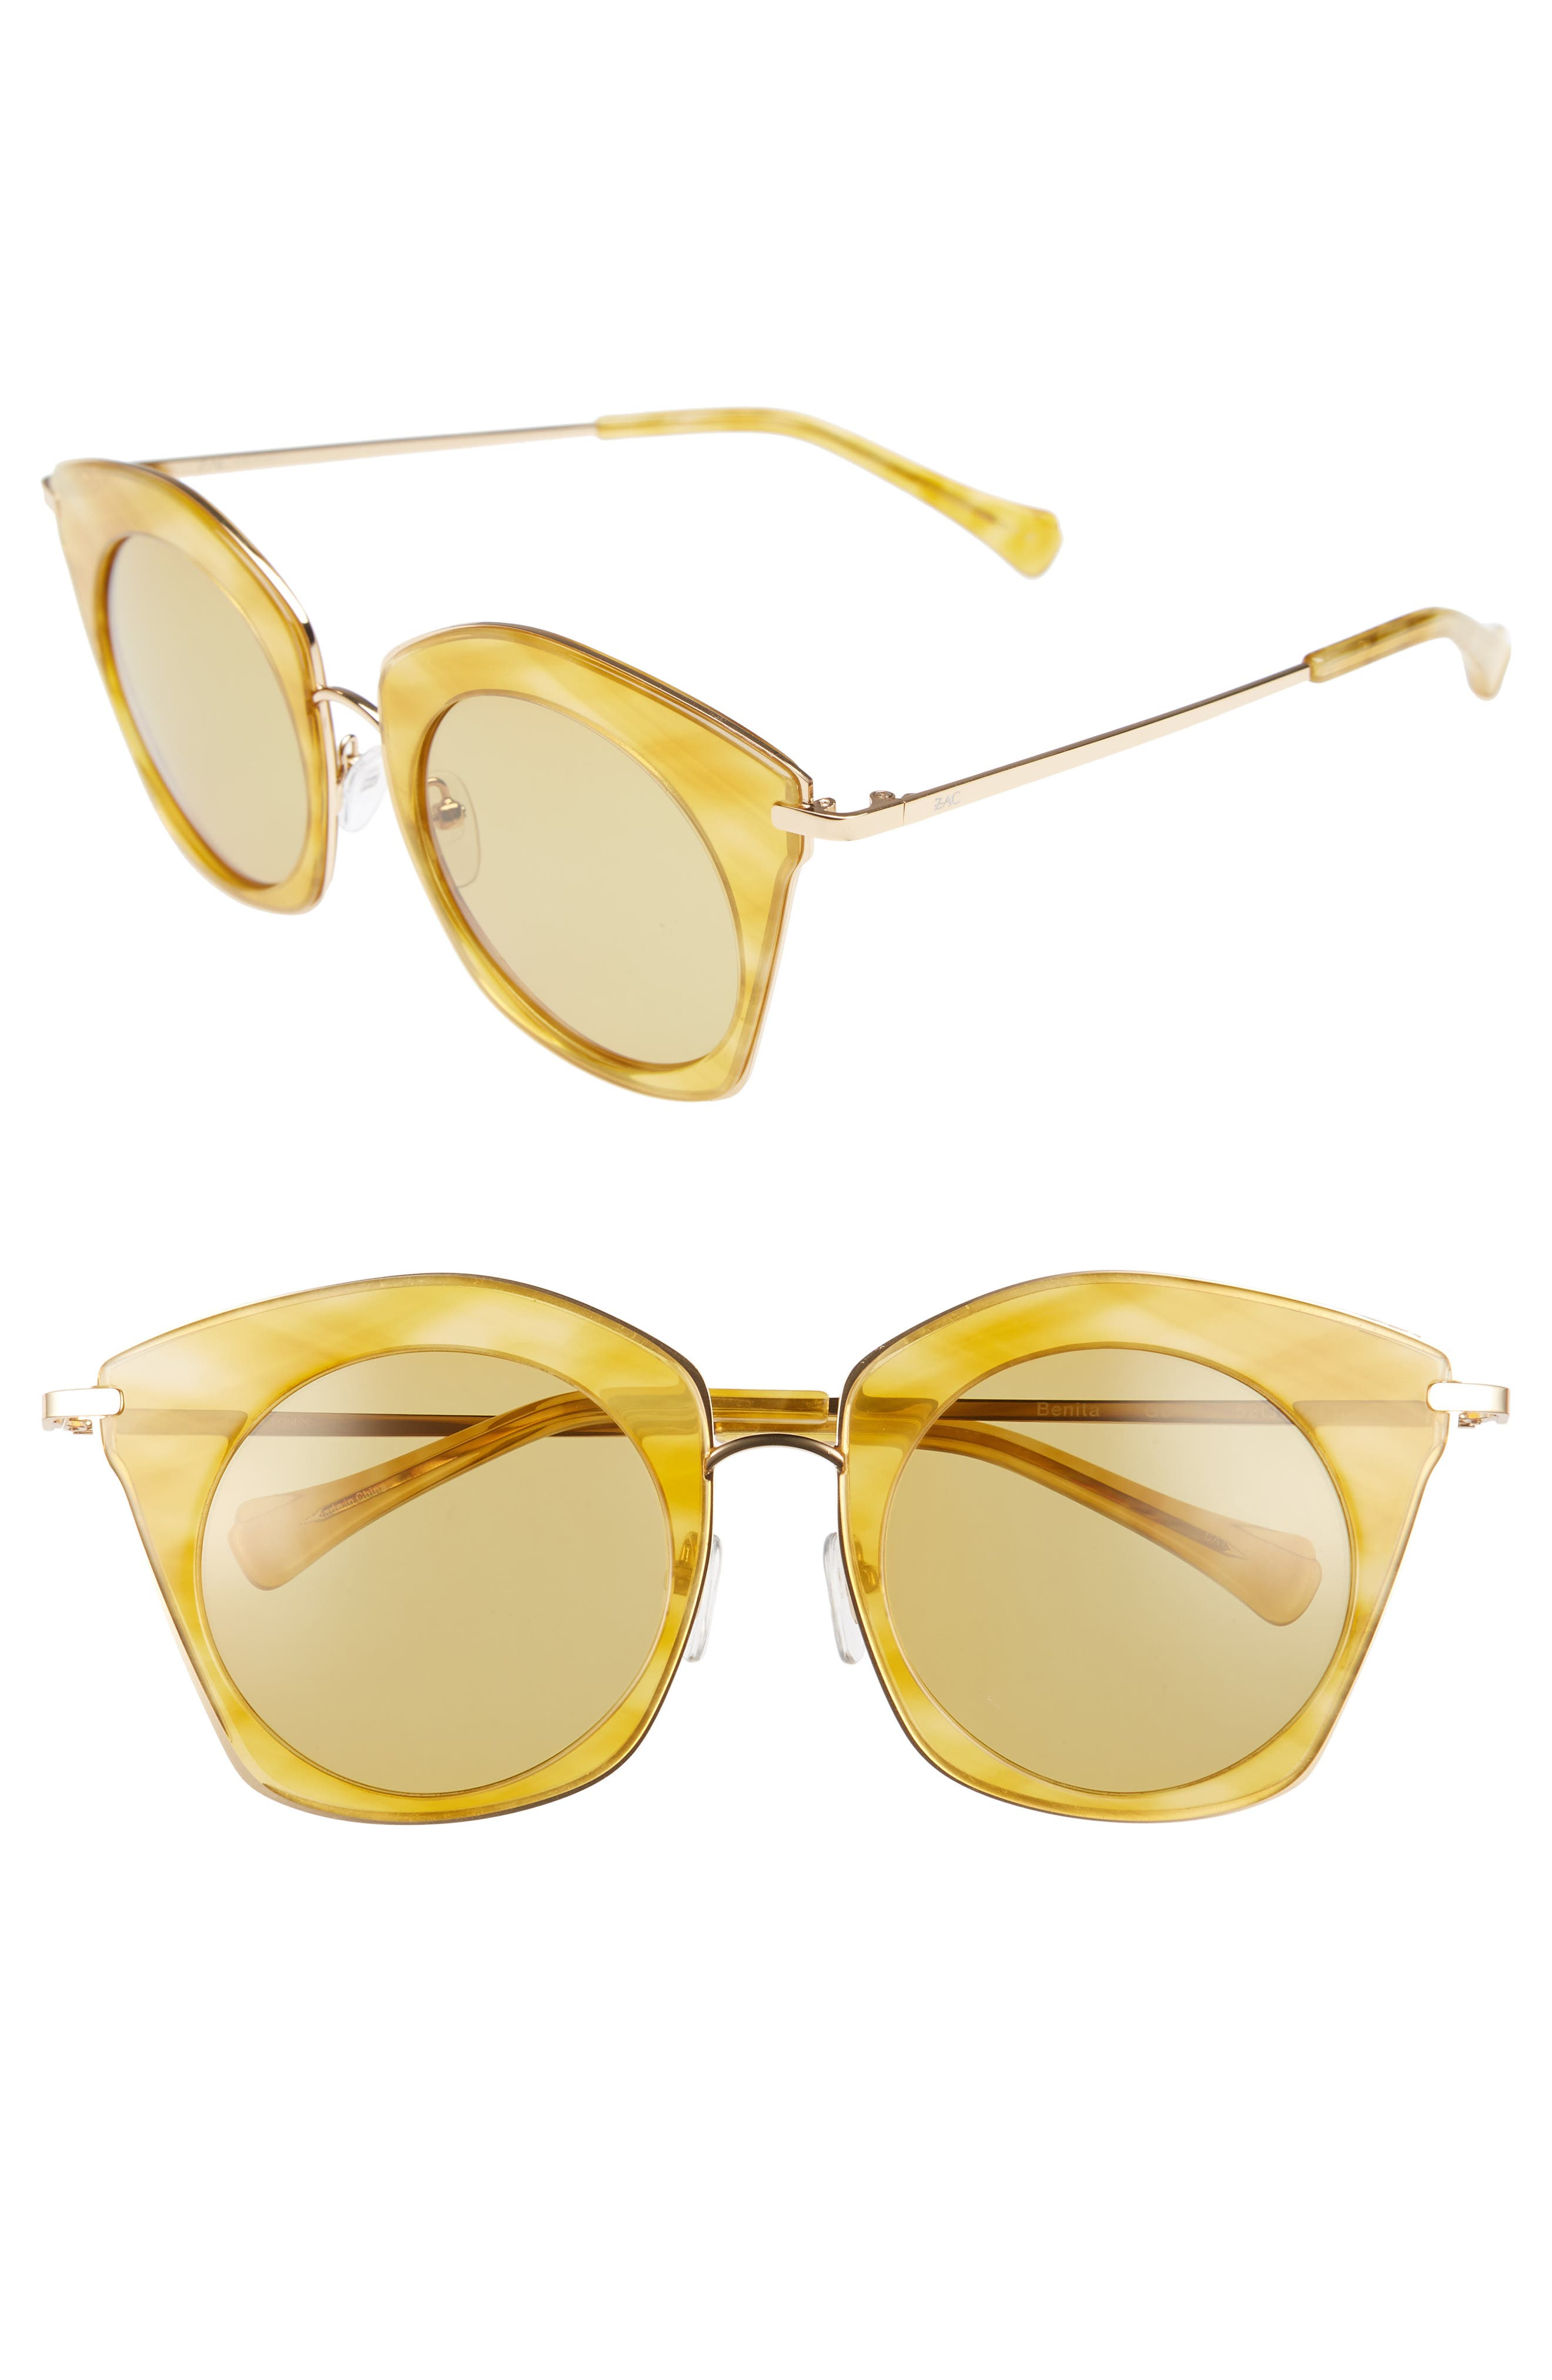 ZAC Zac Posen Benita 52mm Polarized Sunglasses